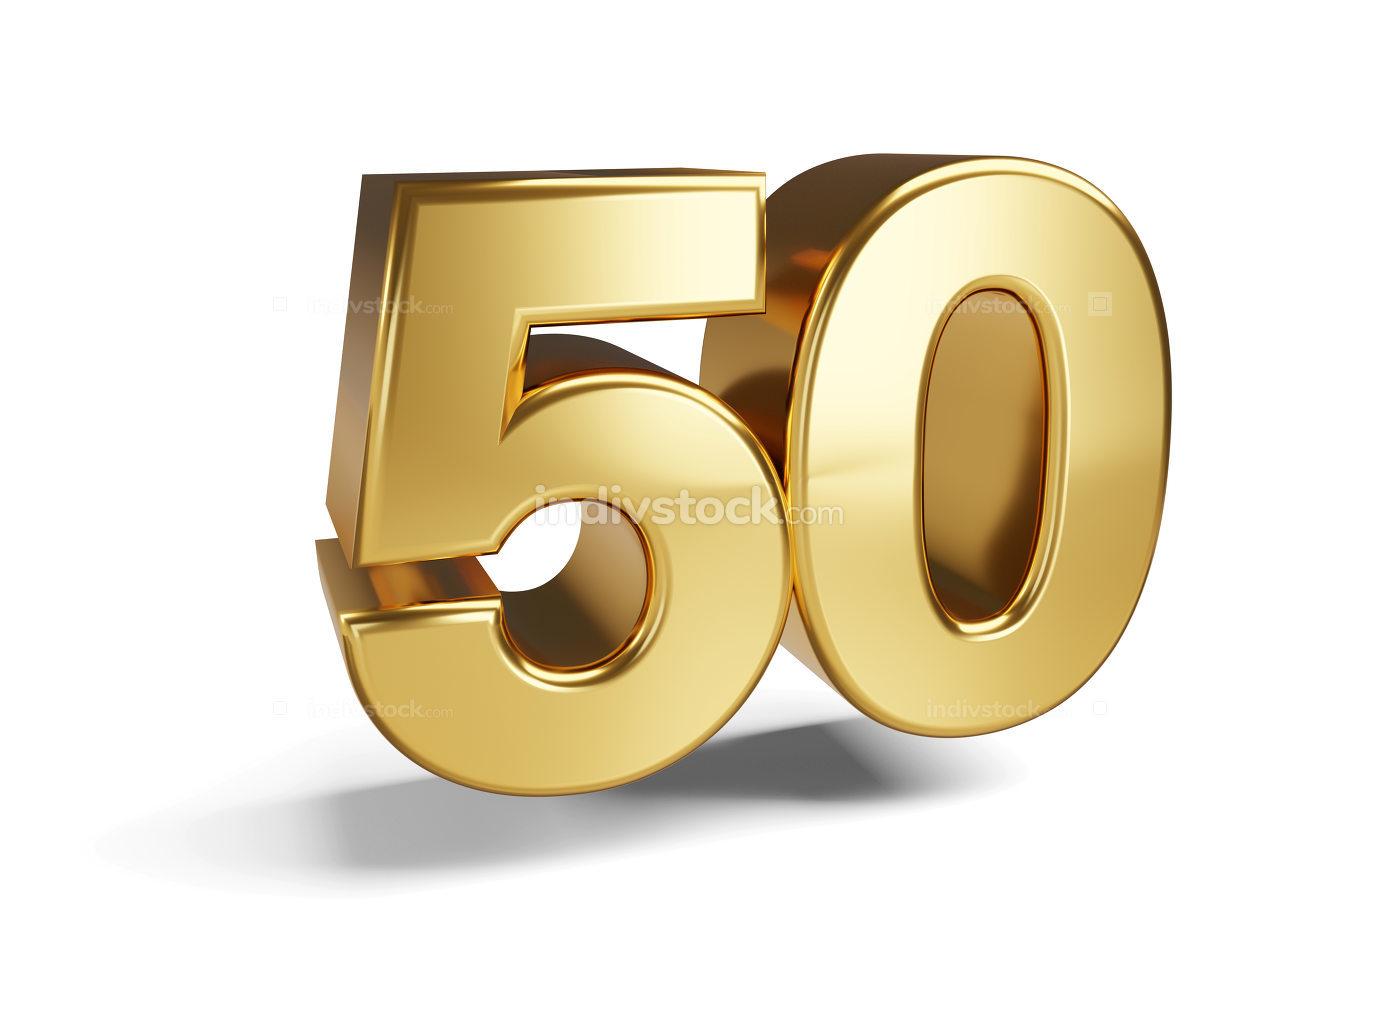 50 symbol 3d-illustration